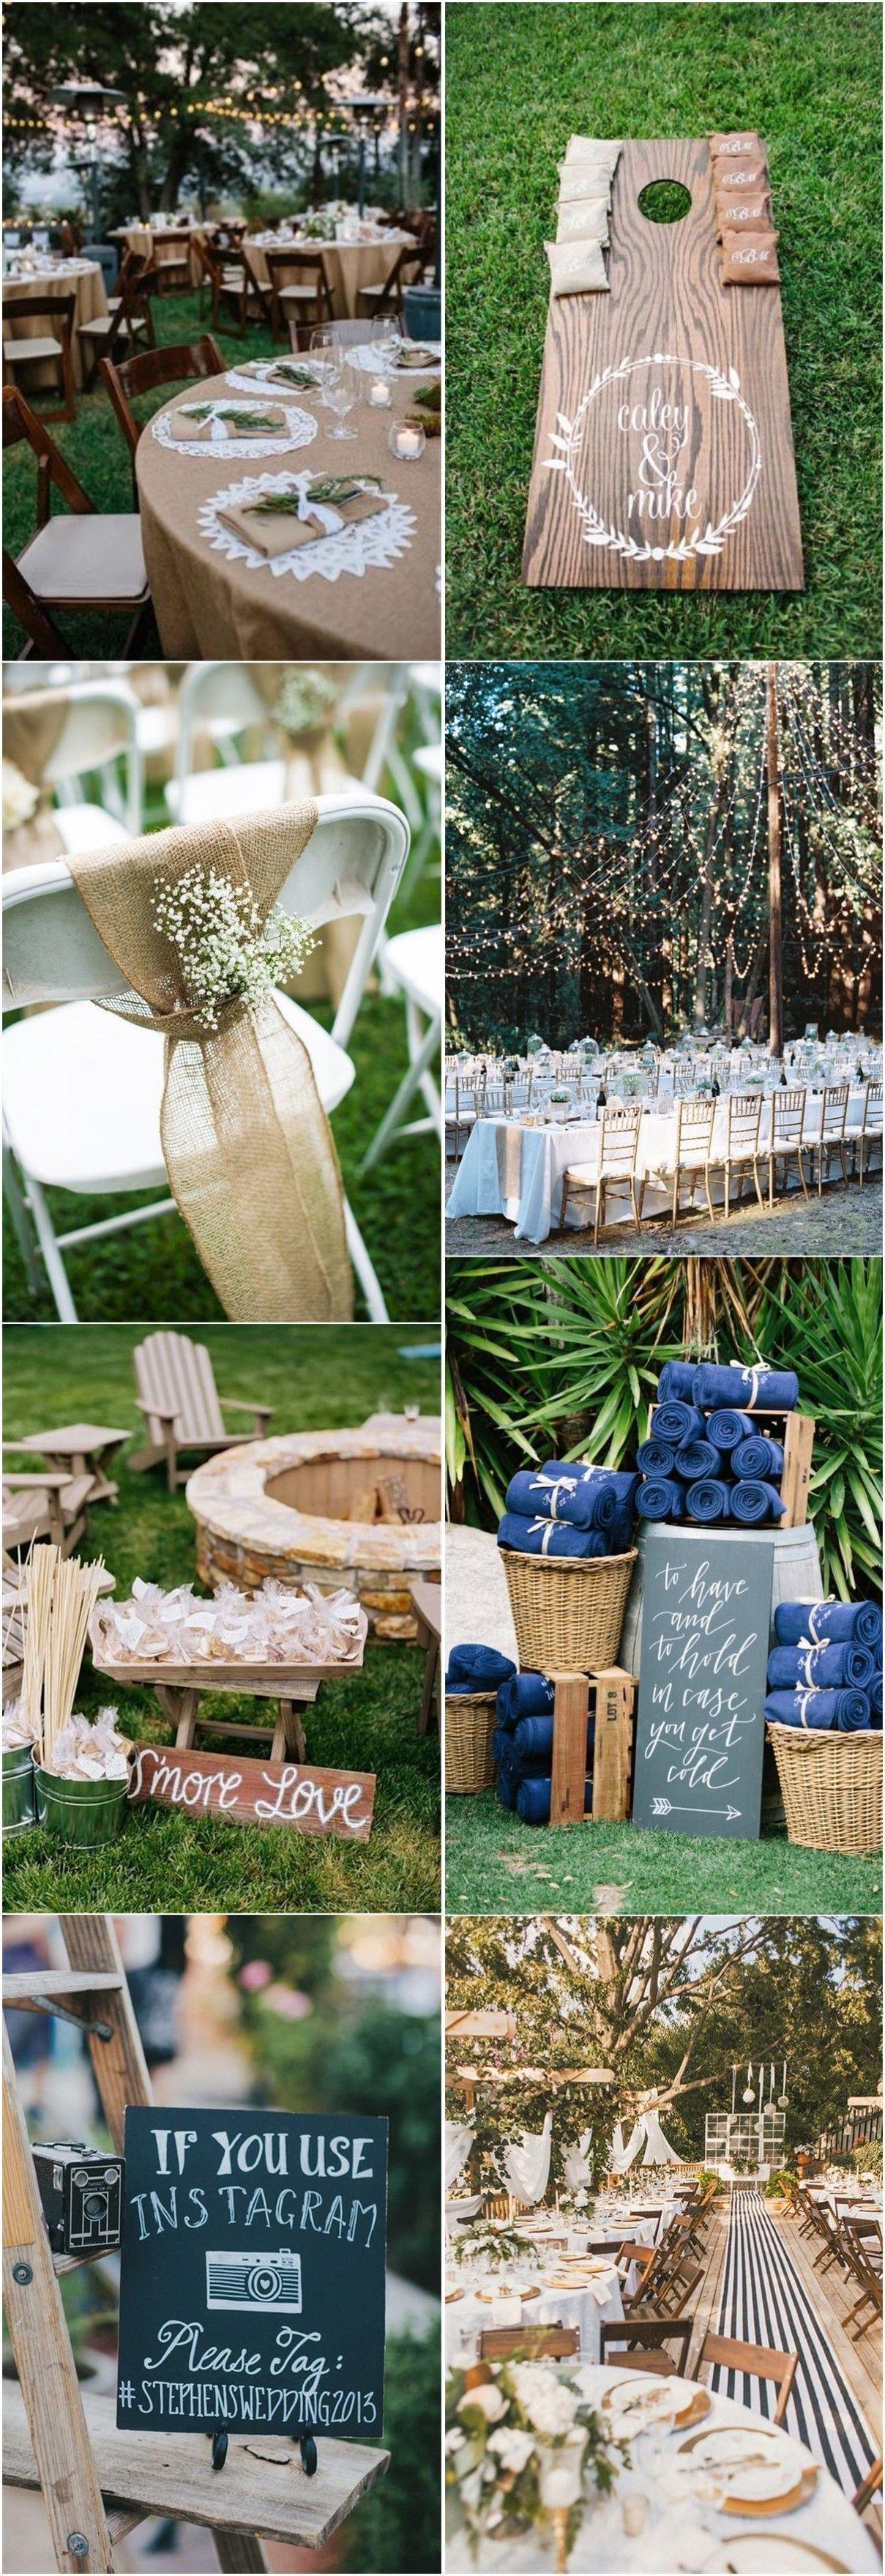 backyard bitecloth ideas in wedding inexpensive decor com